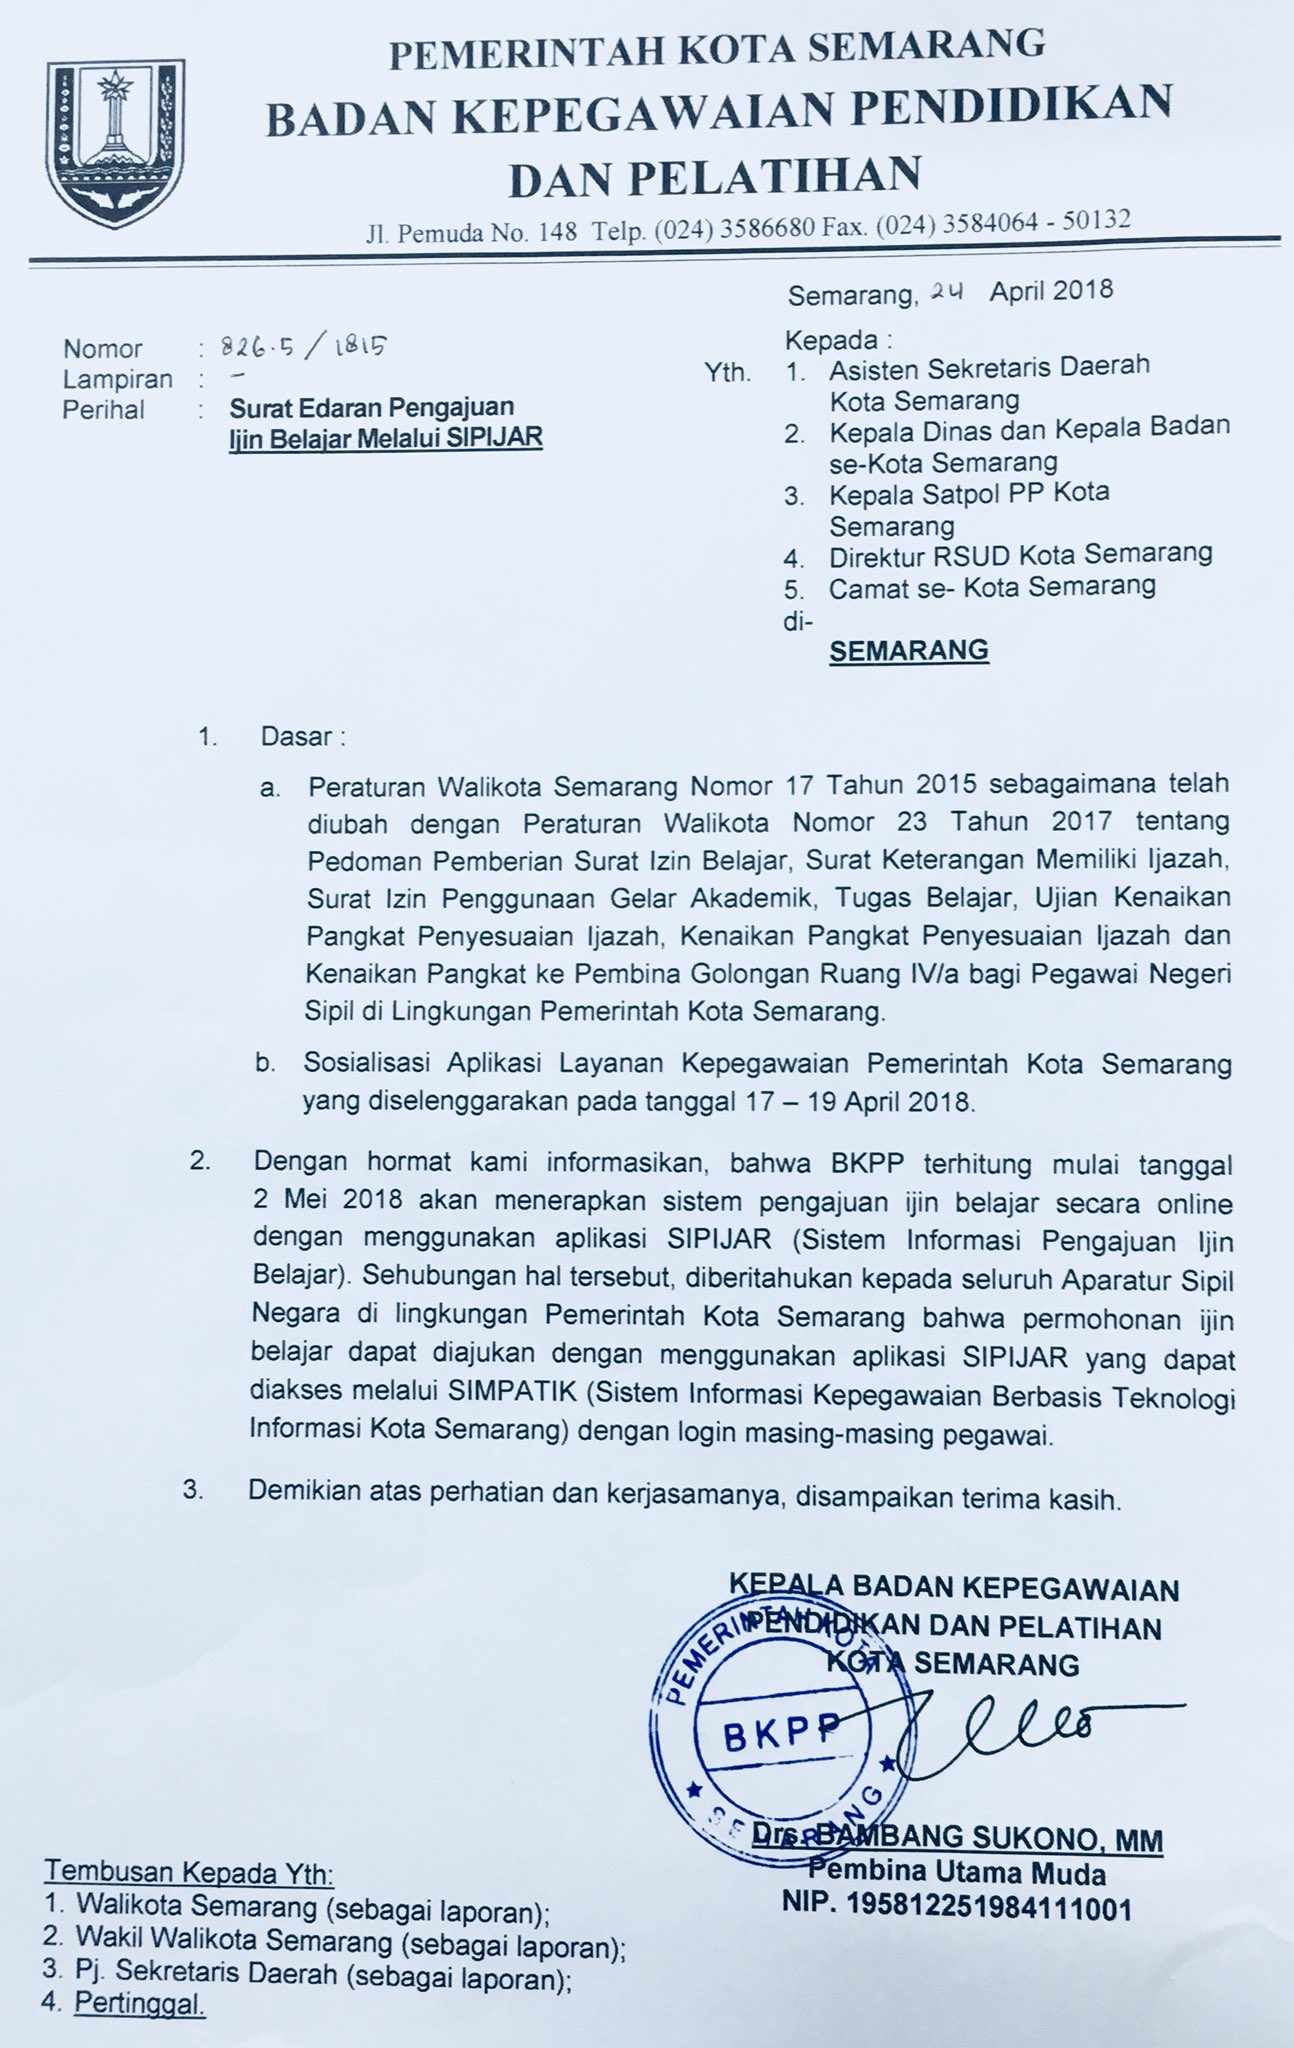 Bkpp Kota Semarang On Twitter Kabar Gembira Untuk